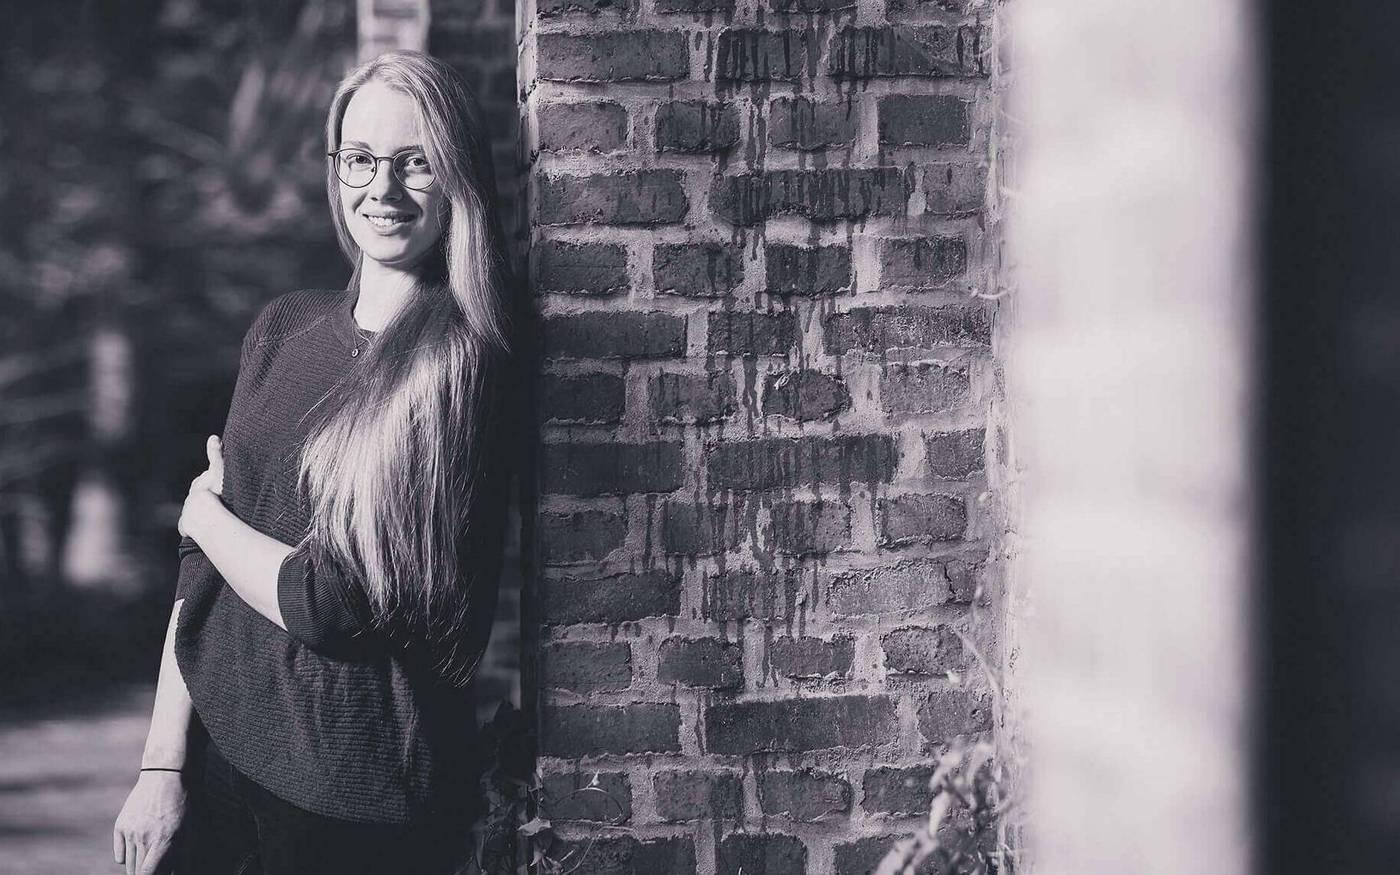 Laura Bremer, Konzept & Design, lehnt an der Mauer der Papierfabrik